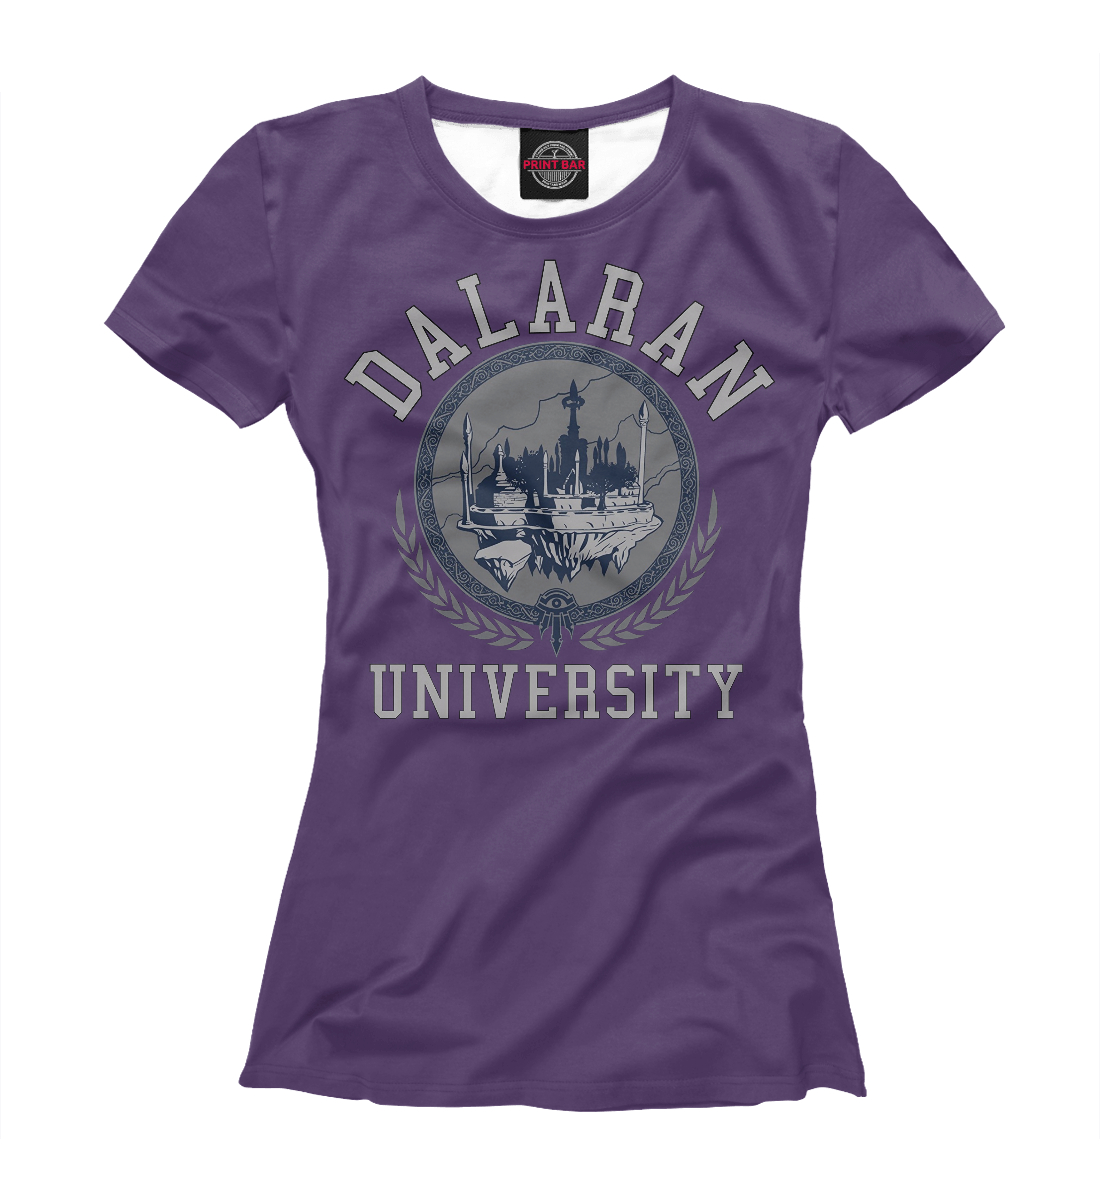 Купить Университет Даларана, Printbar, Футболки, WOW-329379-fut-1